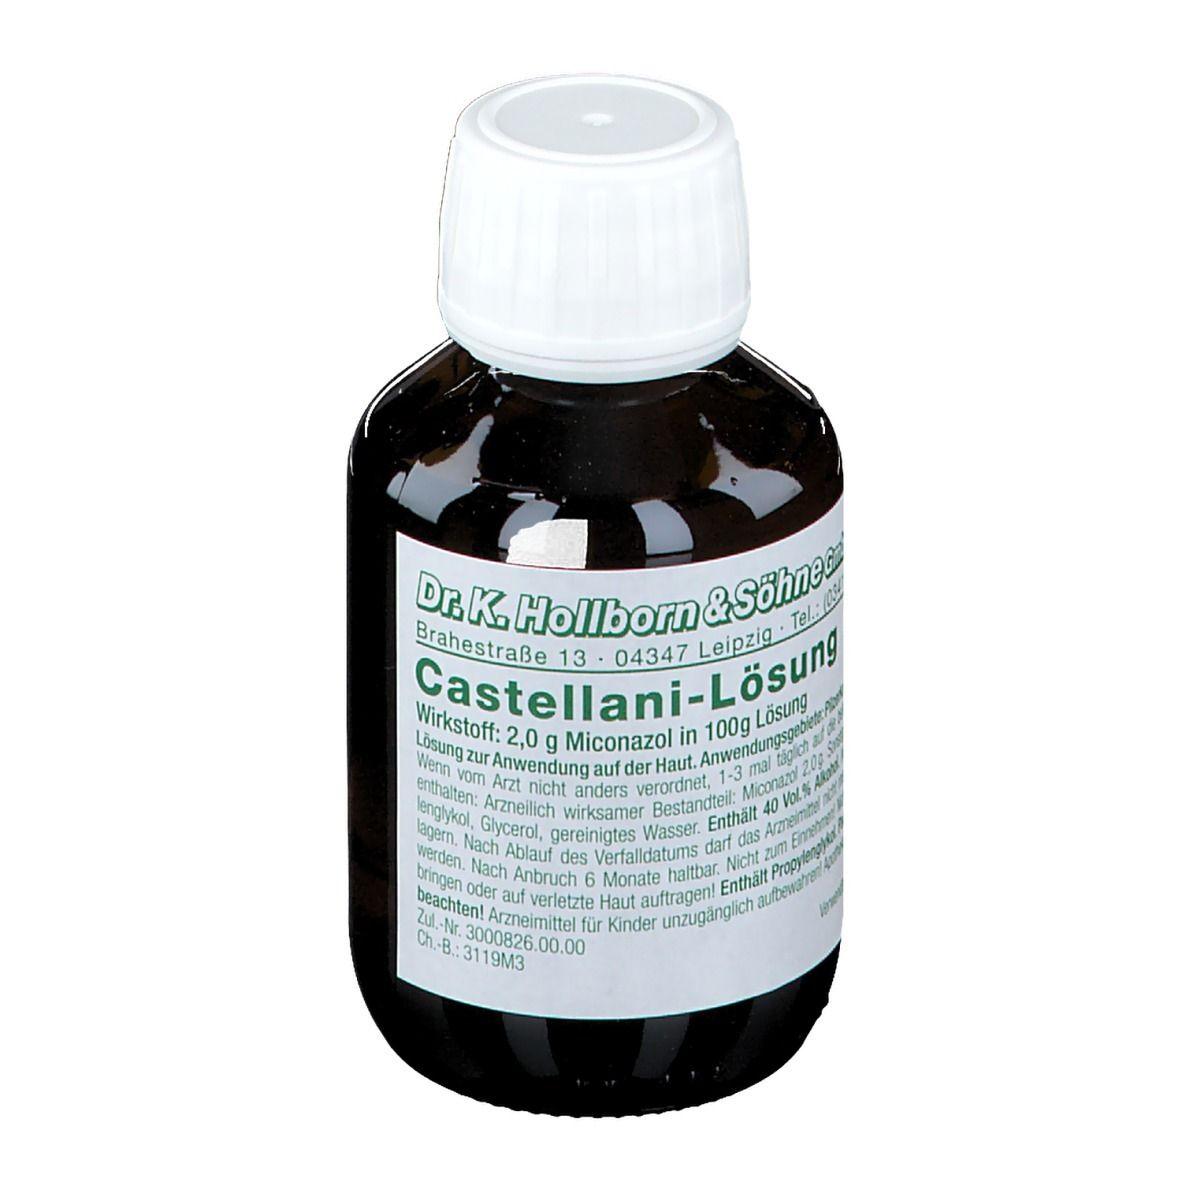 Castellani m. Miconazol Loesung